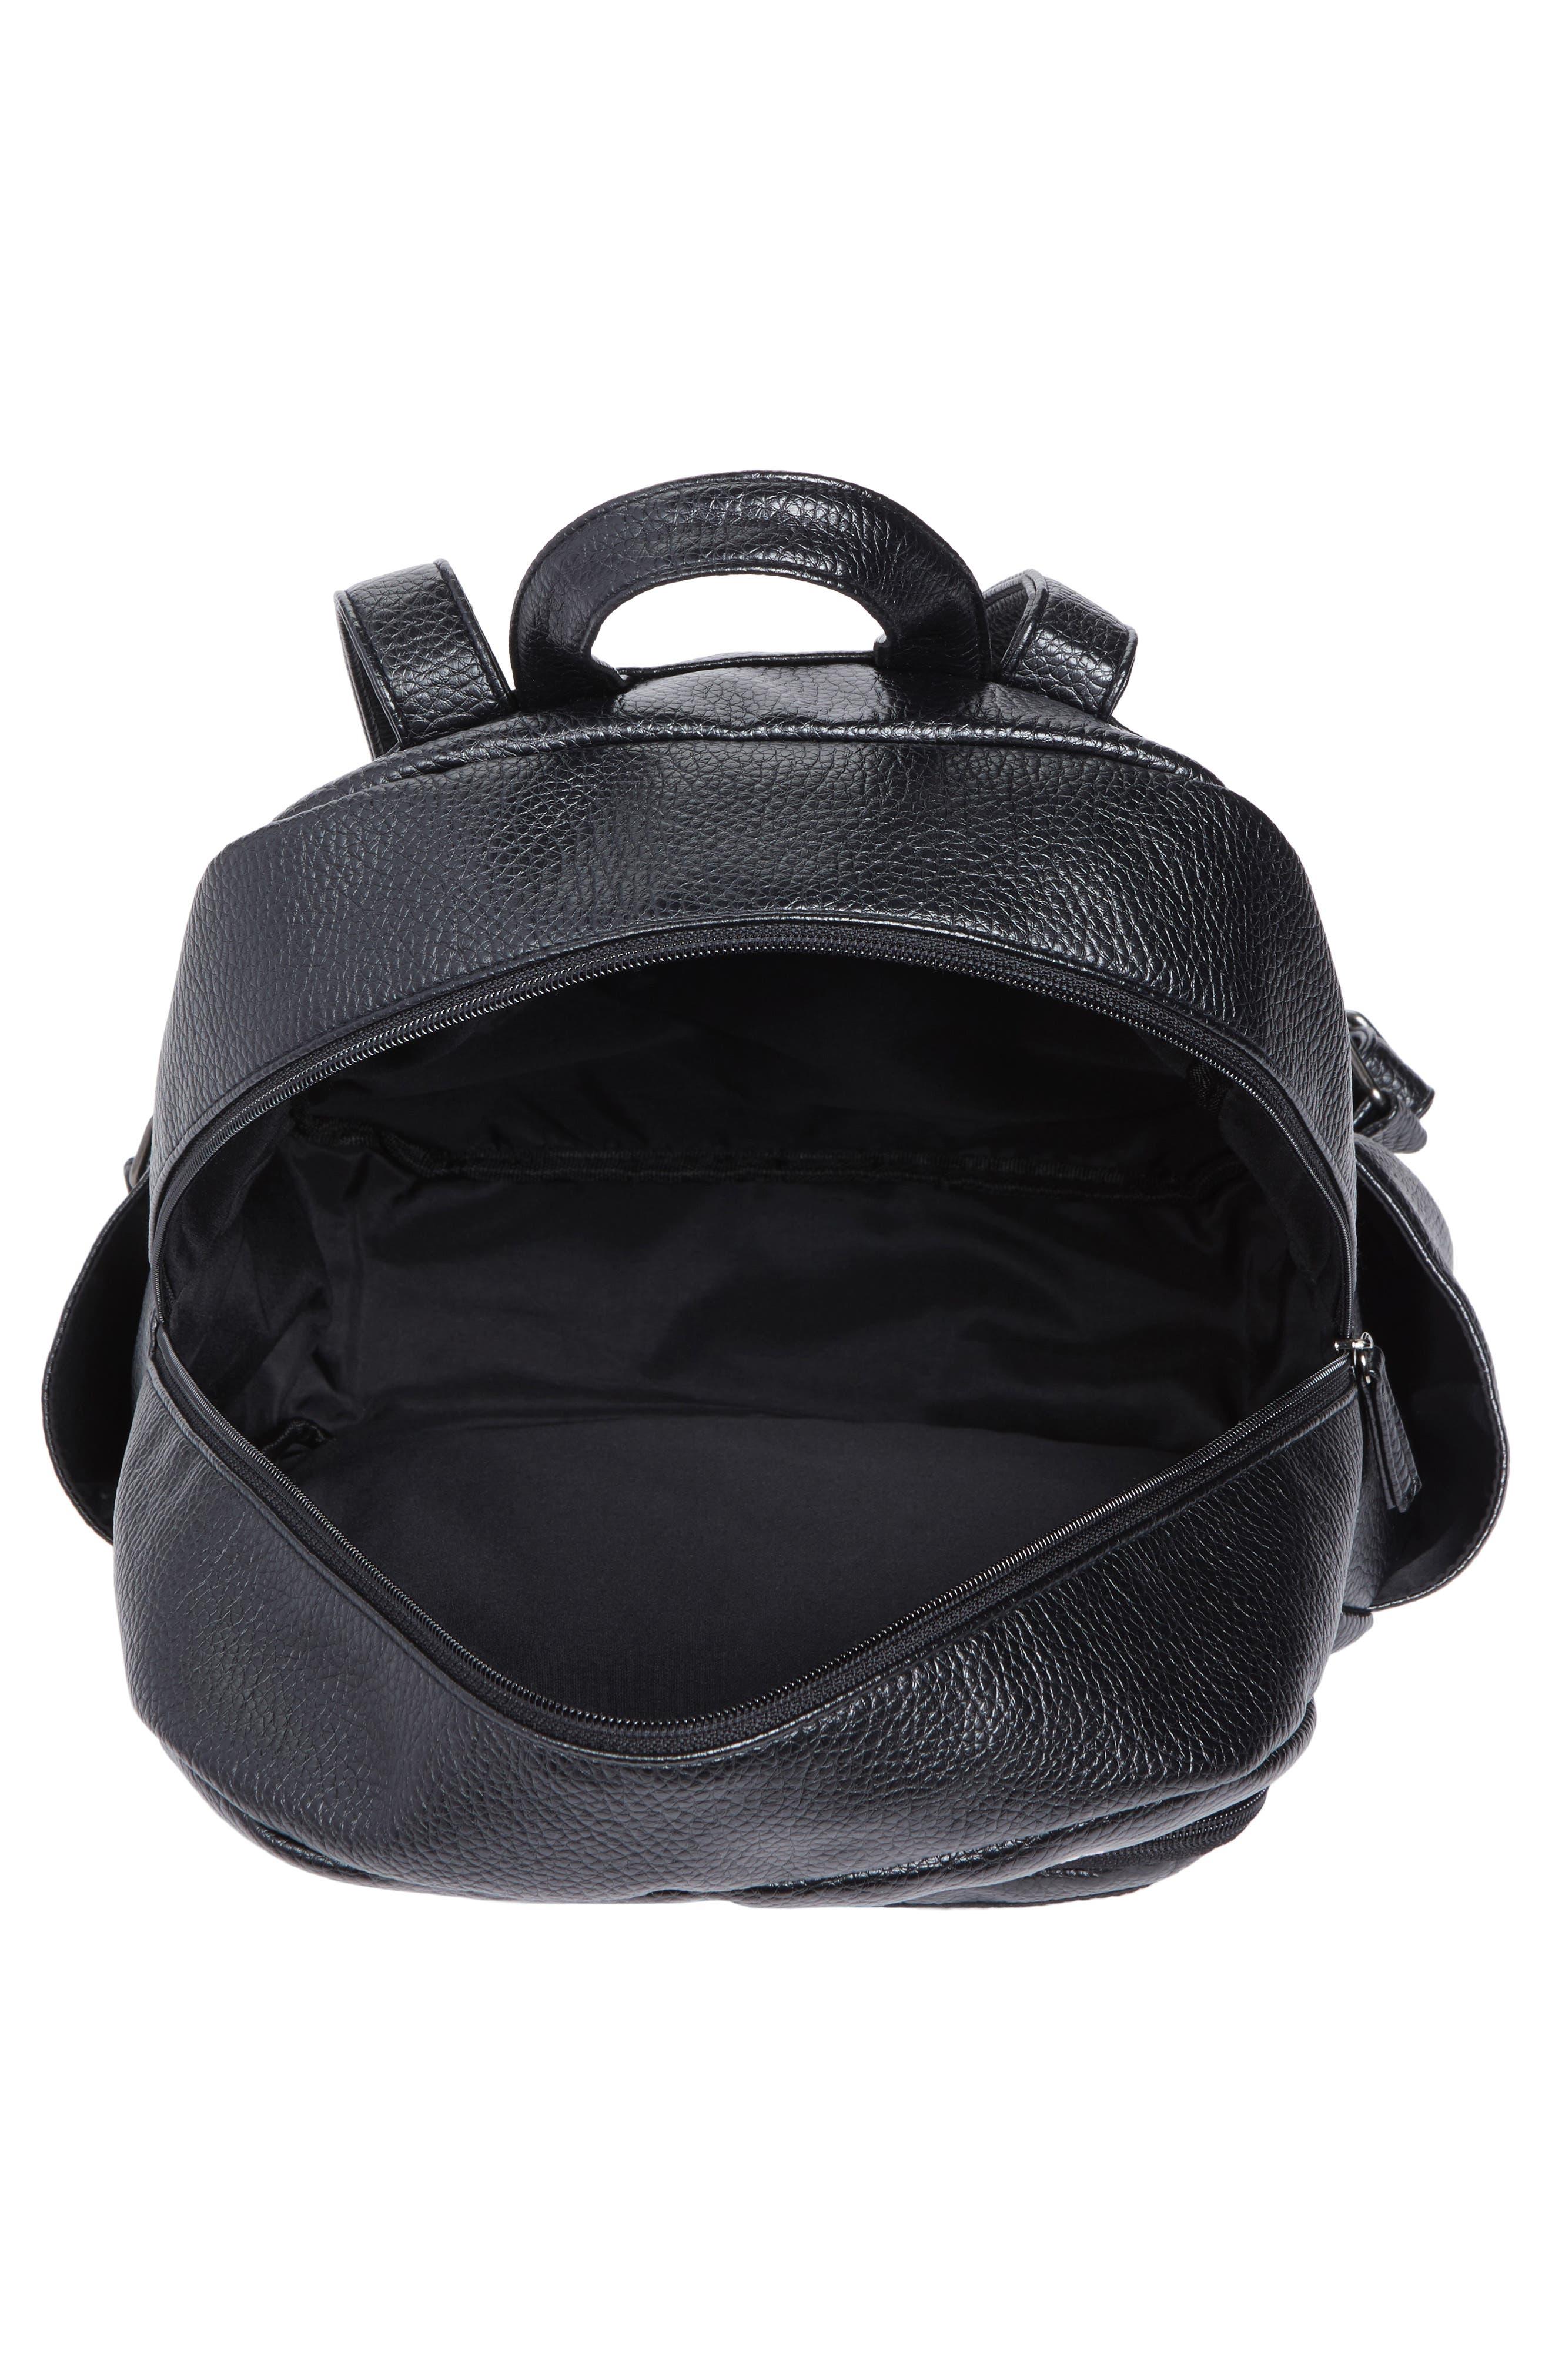 Embroidered Backpack,                             Alternate thumbnail 6, color,                             Black